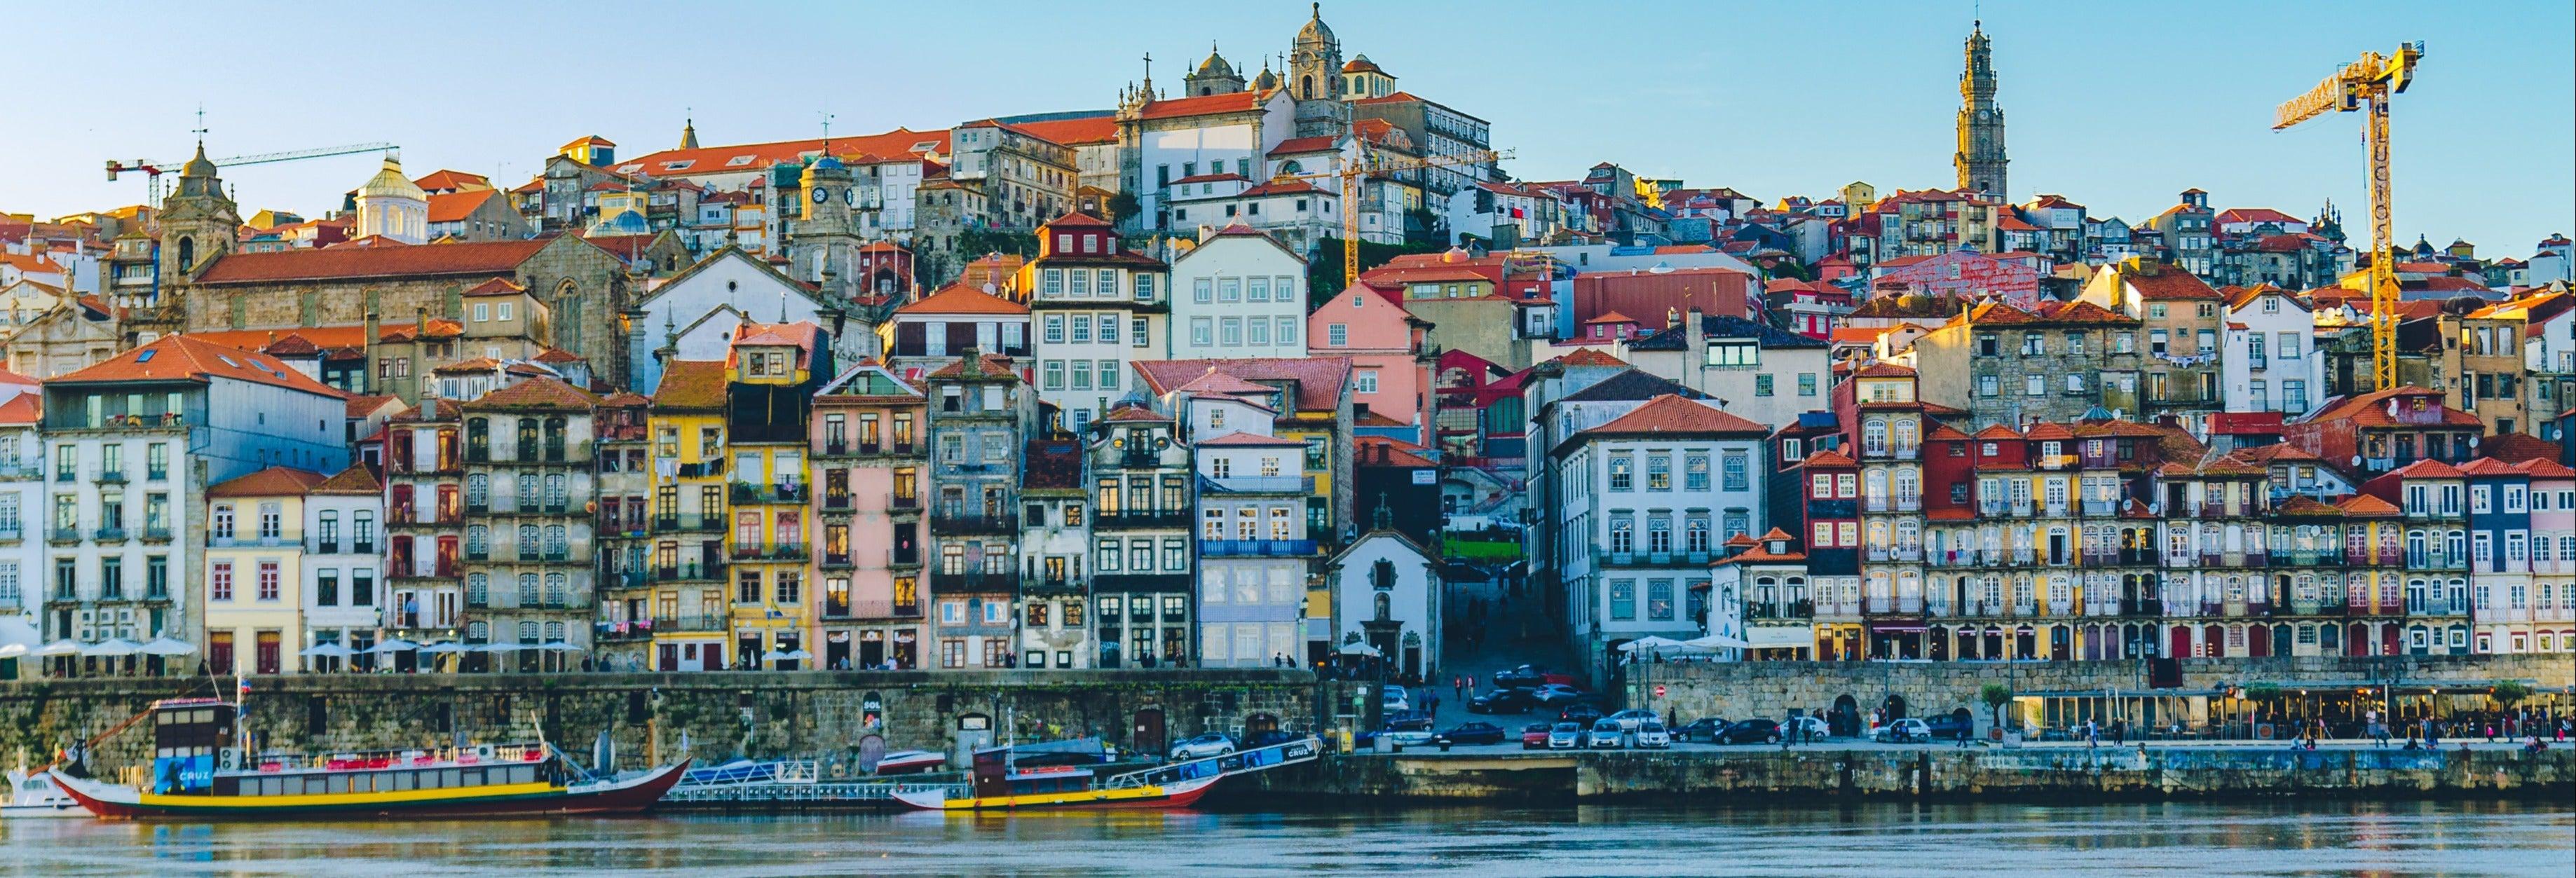 Tour por el Oporto medieval